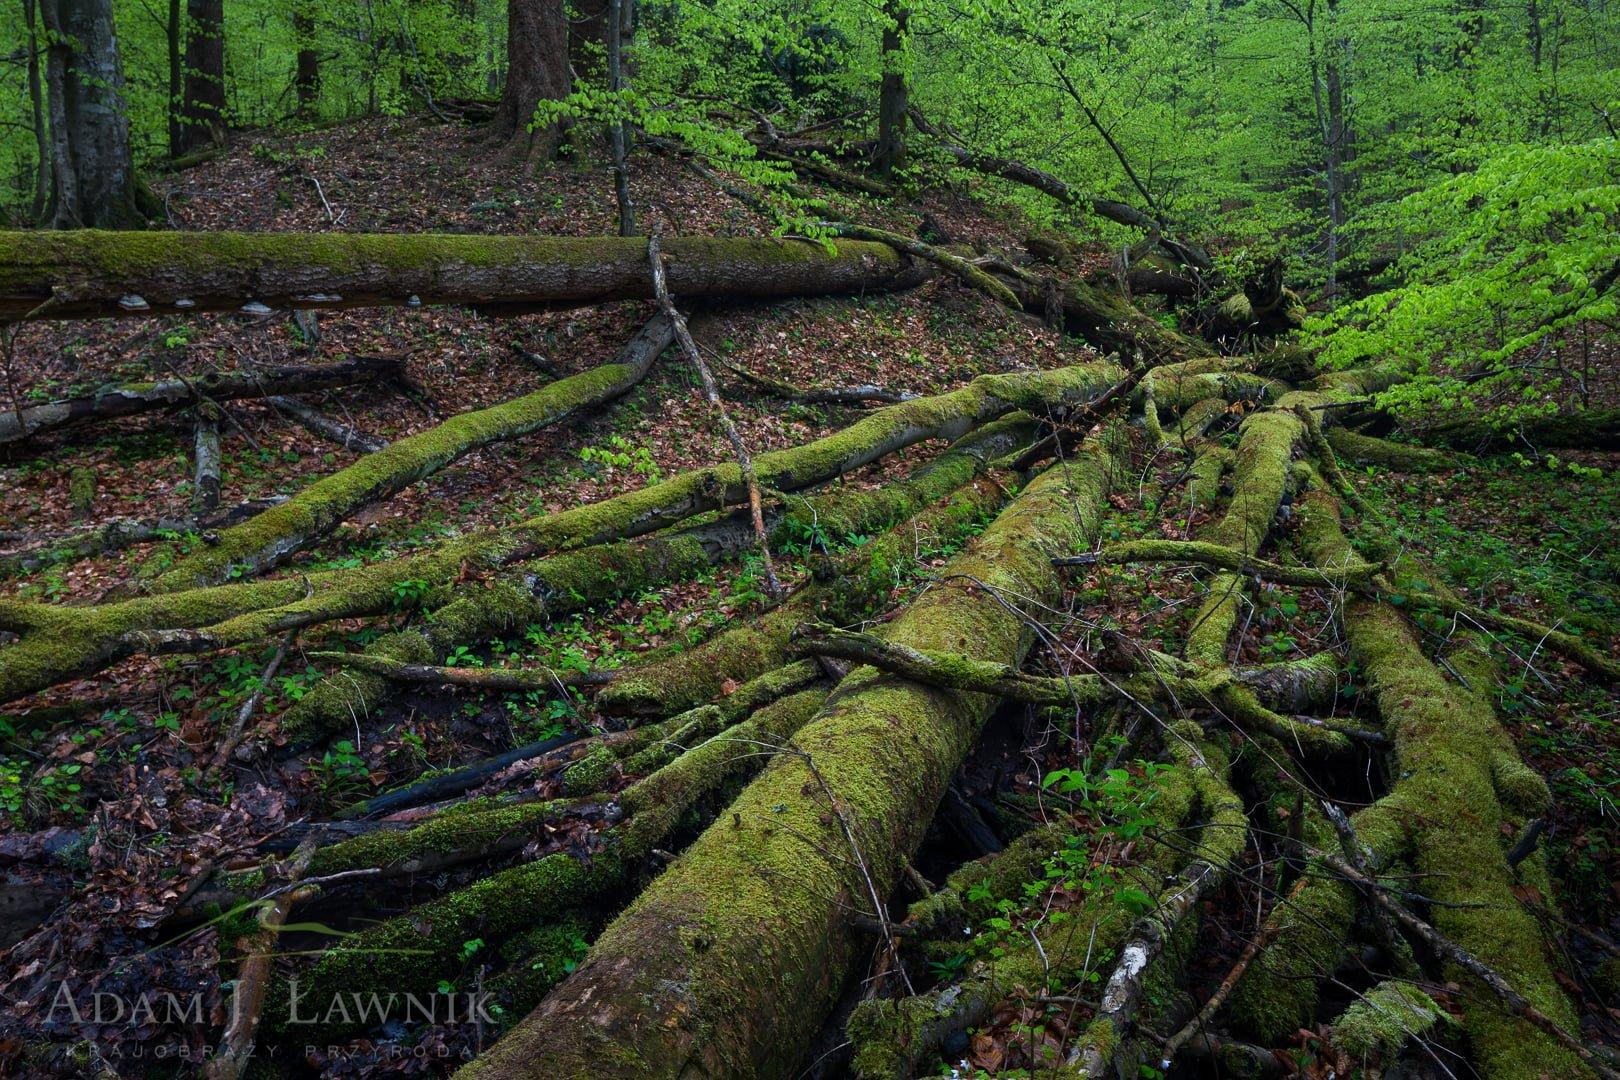 Turnica National Park, Poland 1704-00498C